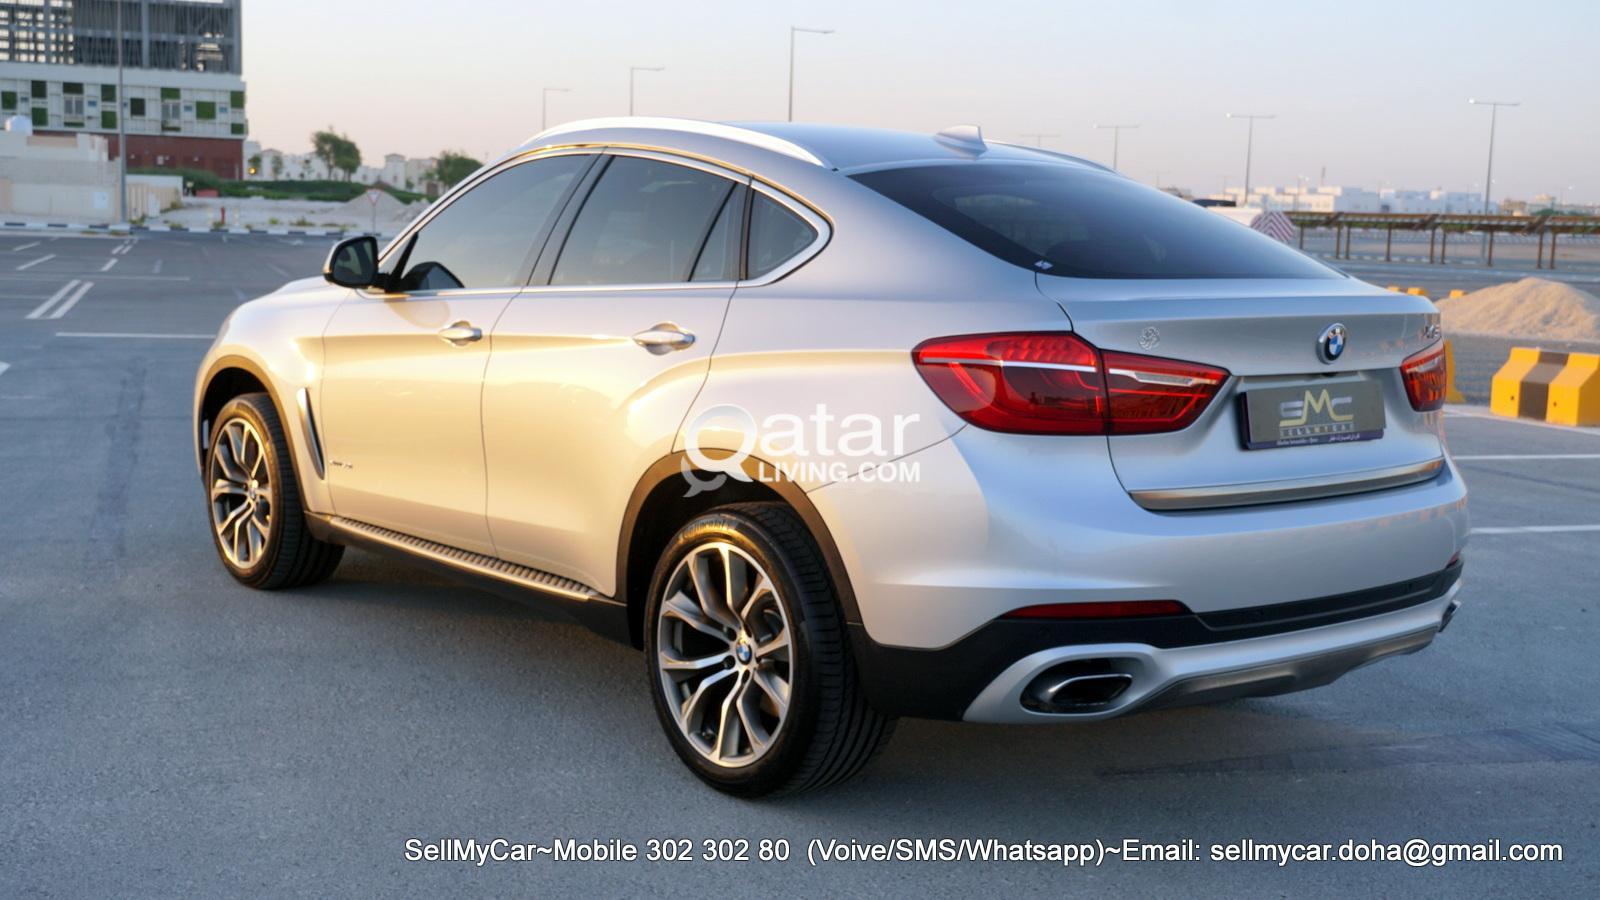 2018 BMW X6 5.0 X-Drive (Sport + Premium Package)